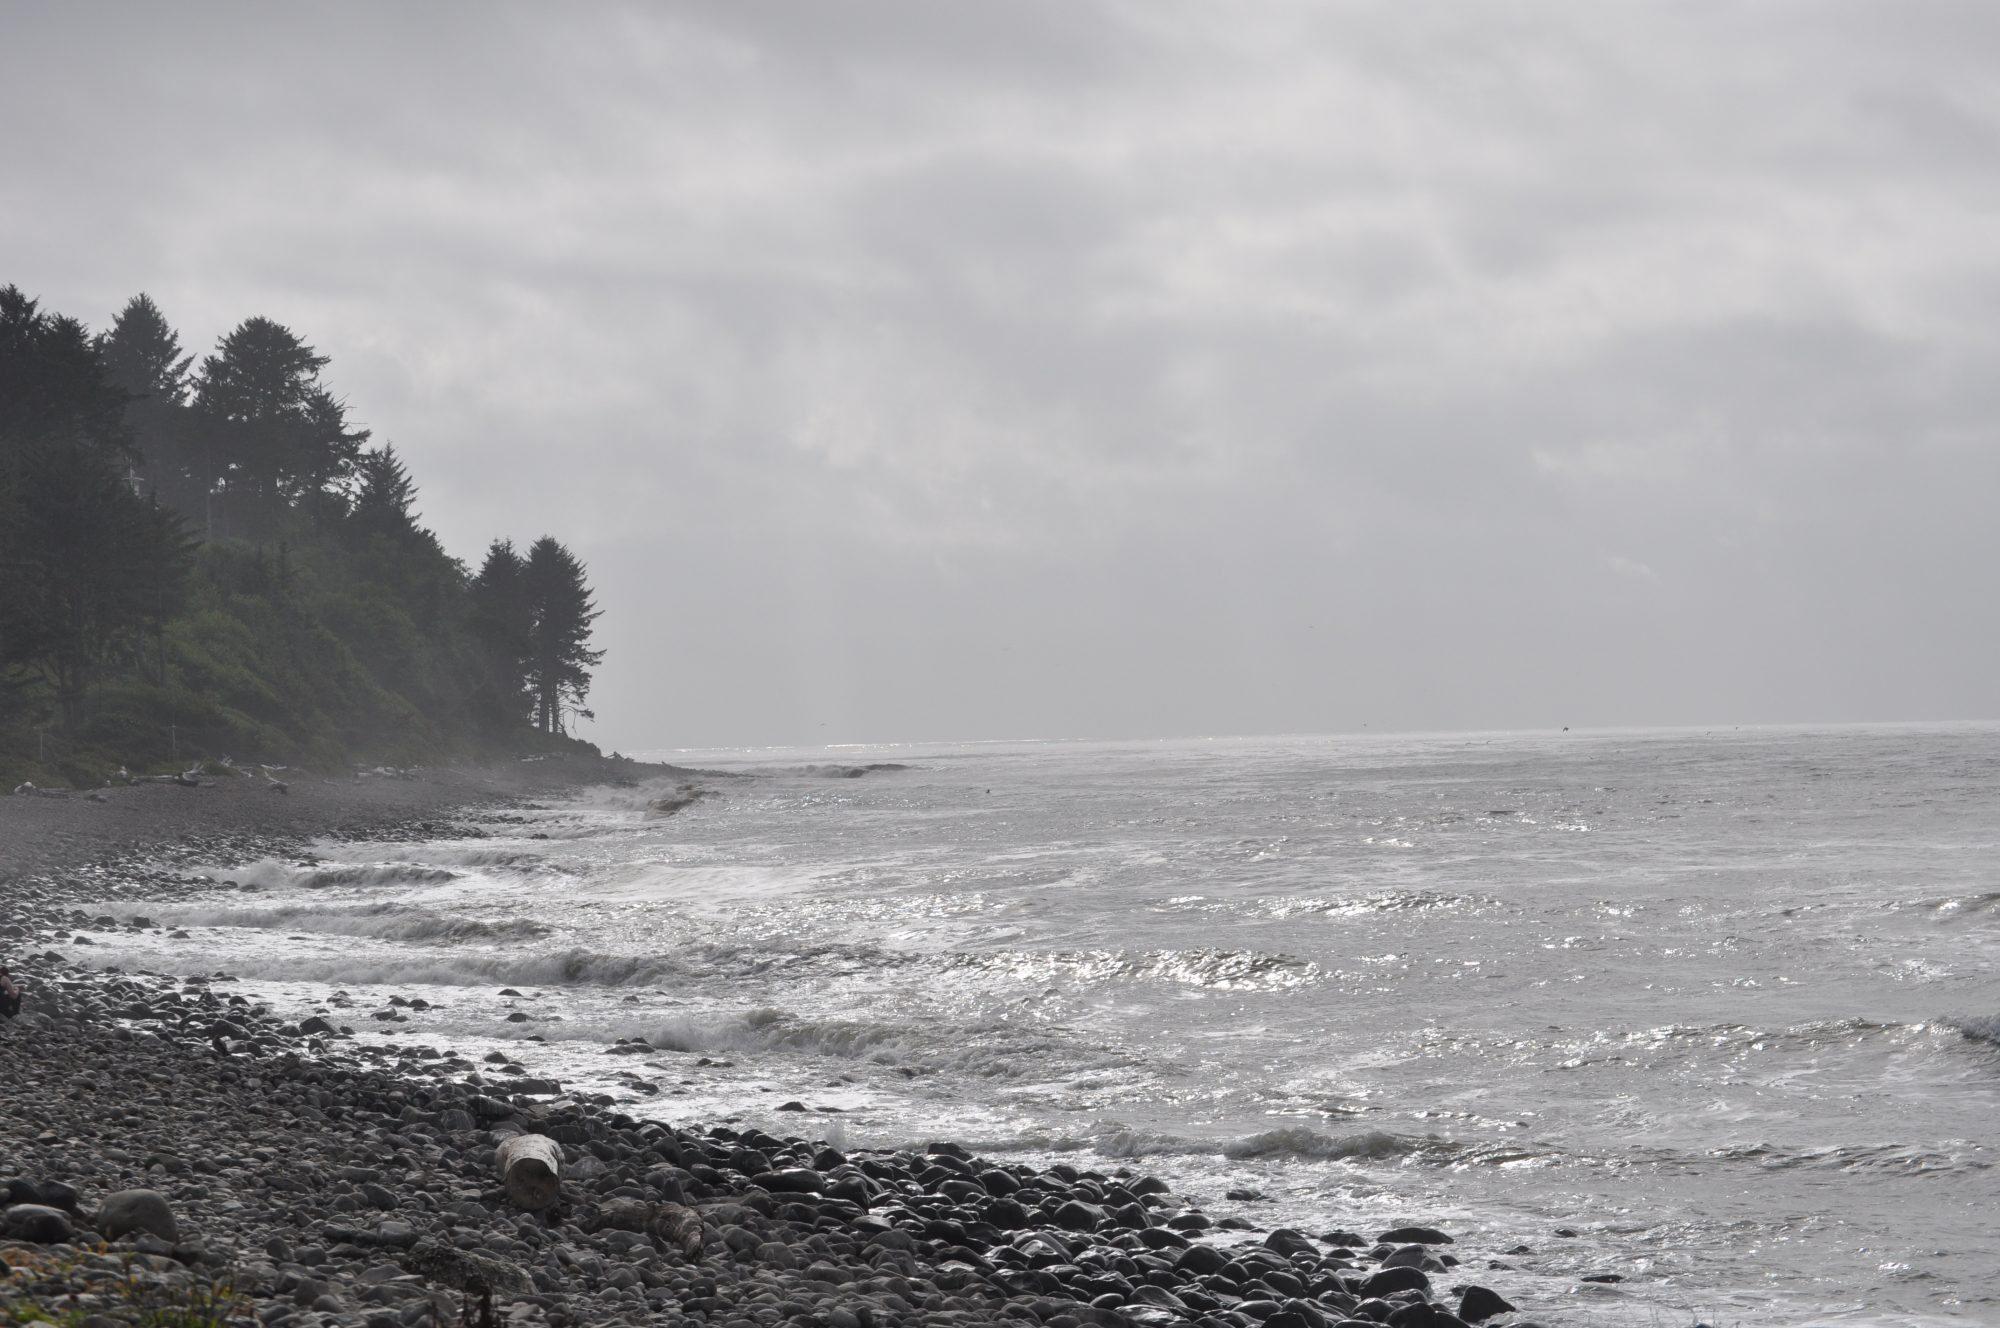 Tillamook Head sits adjacent to Seaside's,